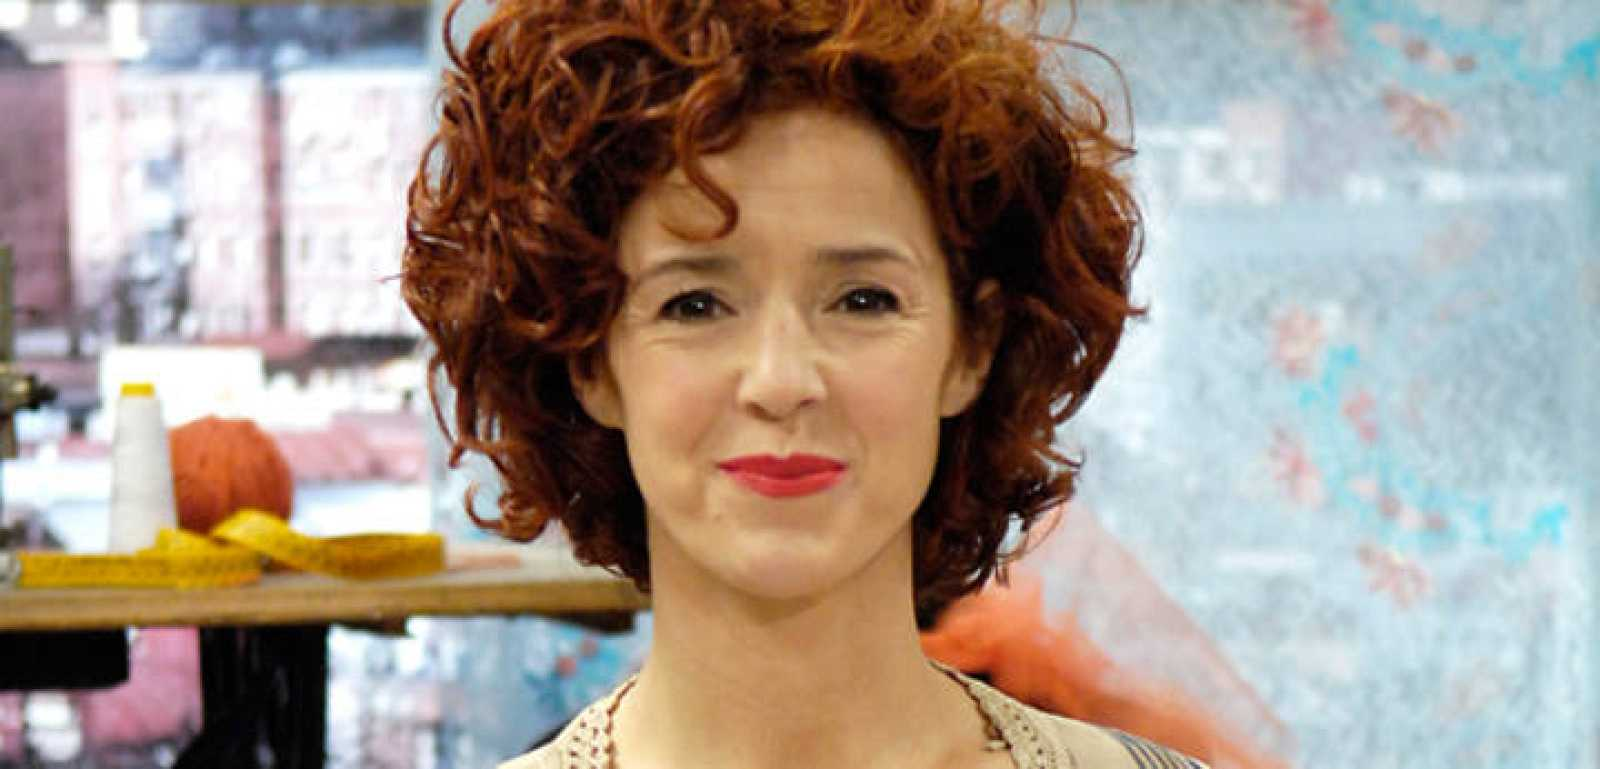 Marta Belenguer interpreta a Encarni en Stamos okupa2